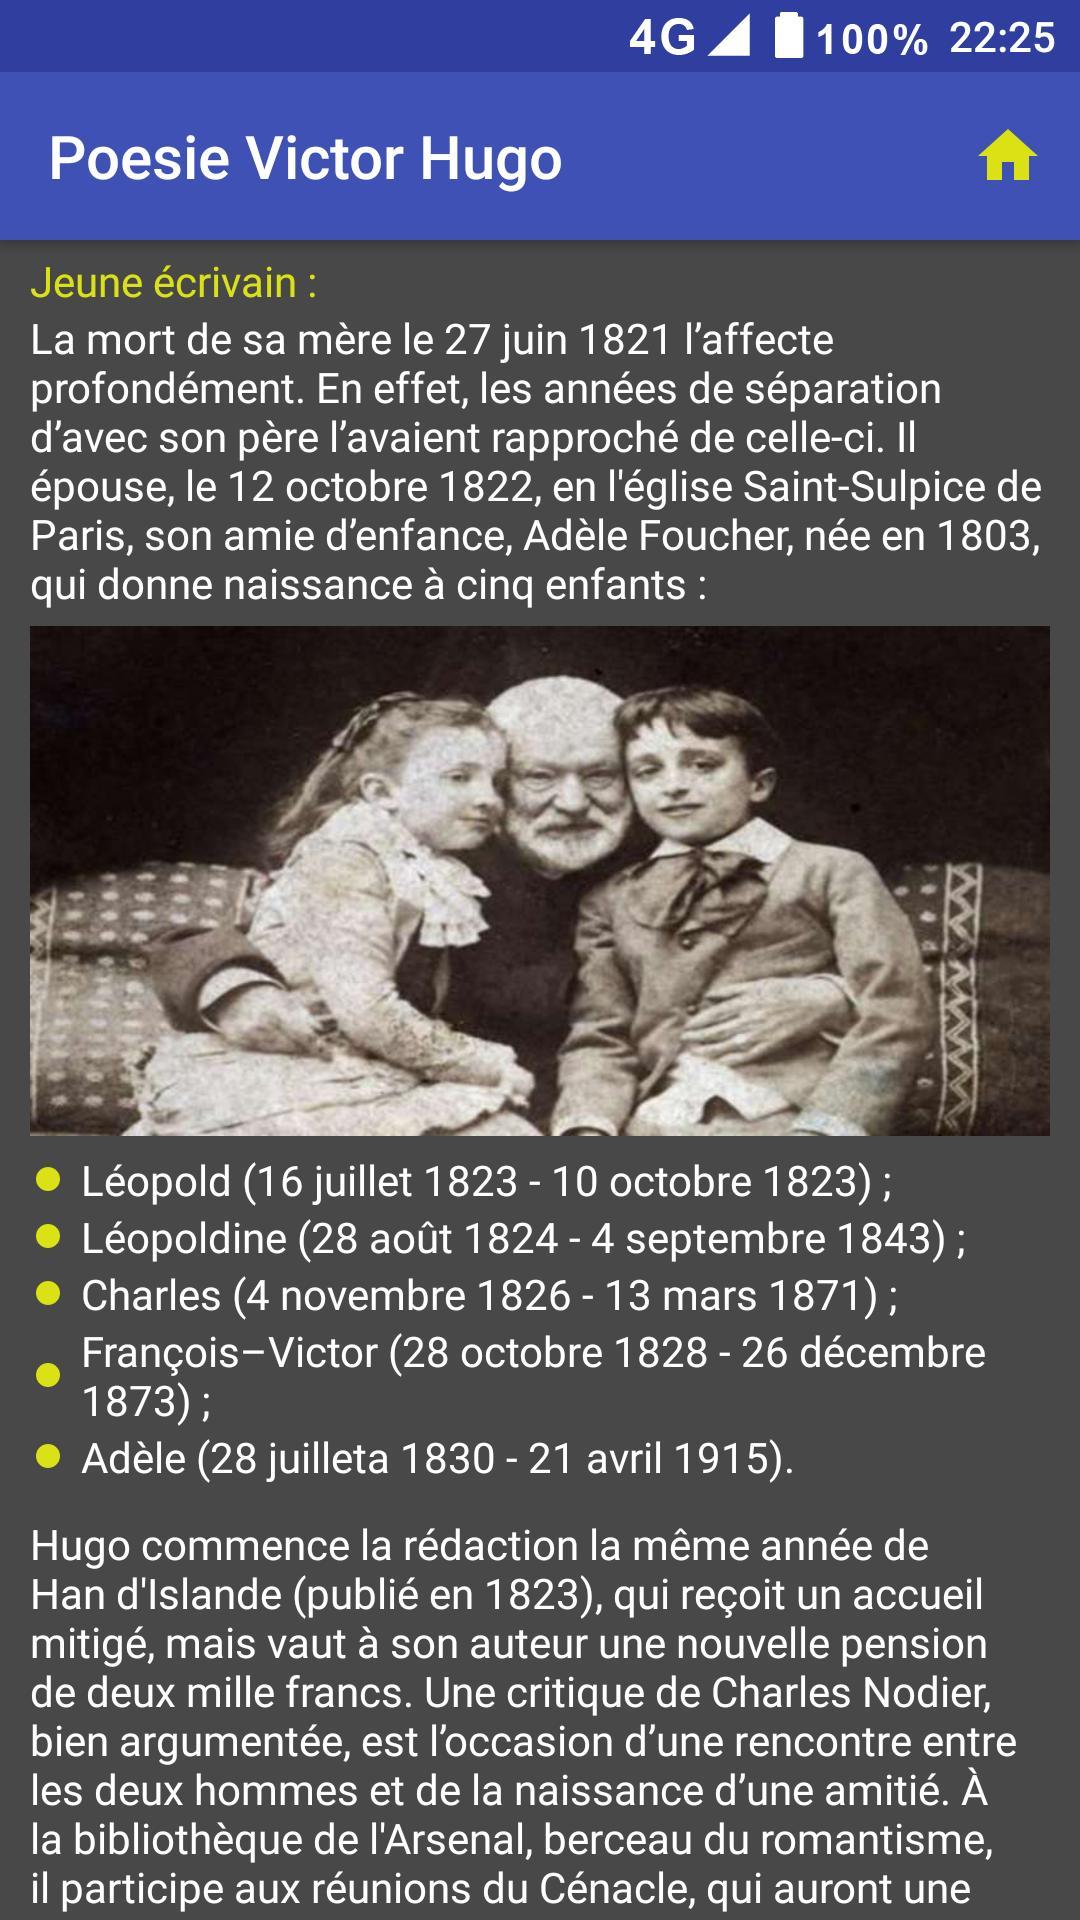 Poésie Victor Hugo For Android Apk Download